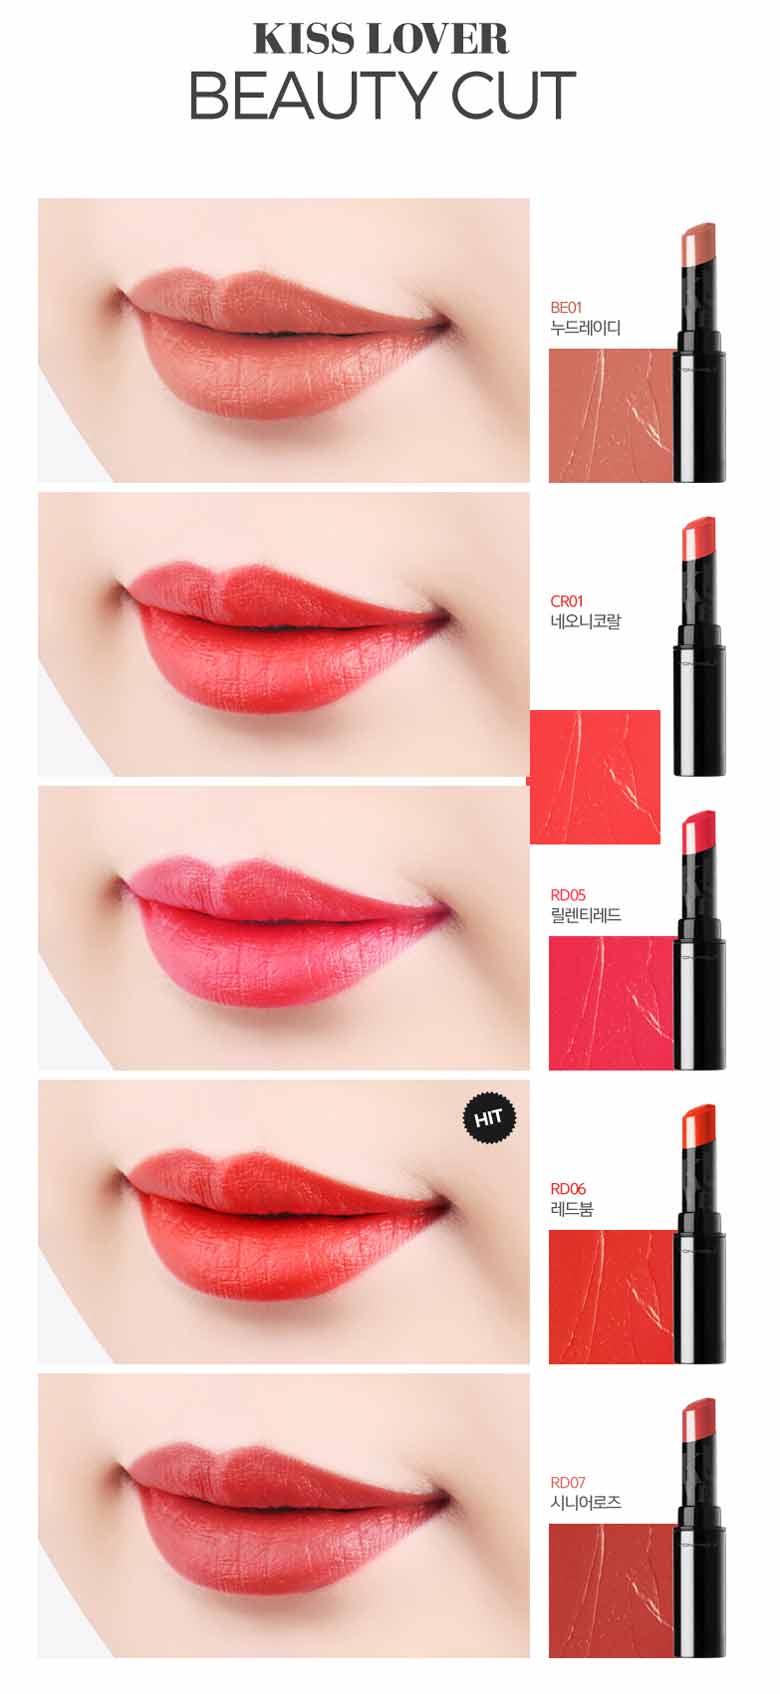 Beauty Box Korea - TONYMOLY Kiss Lover Style Lipstick_M S/S 3.4g   Best Price and Fast Shipping from Beauty Box Korea